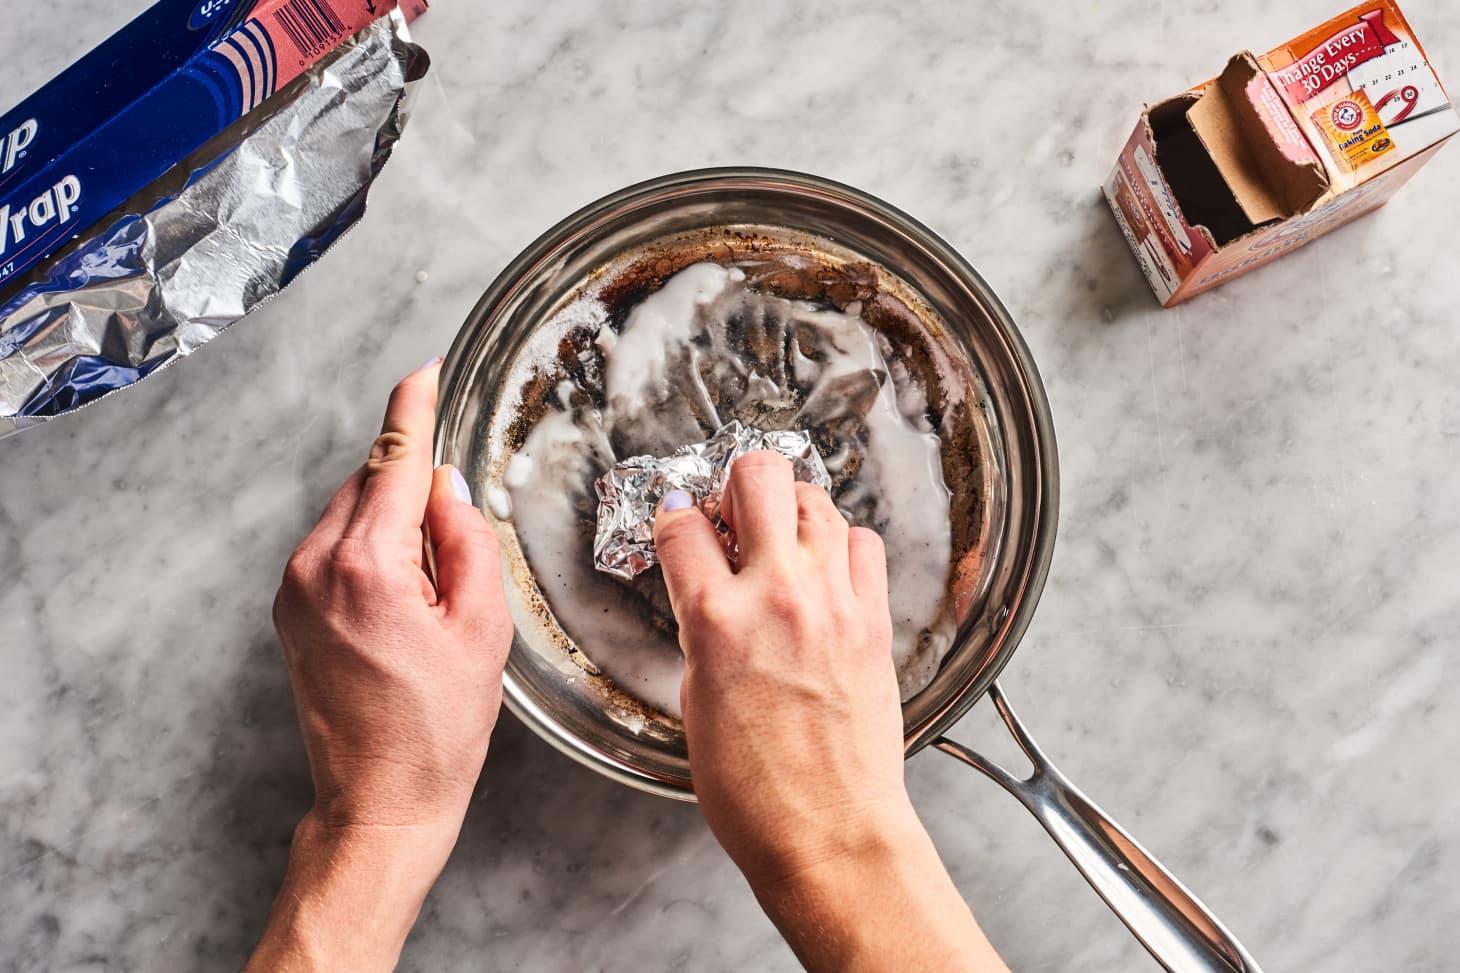 Using baking soda and aluminium foil to clean burnt pot